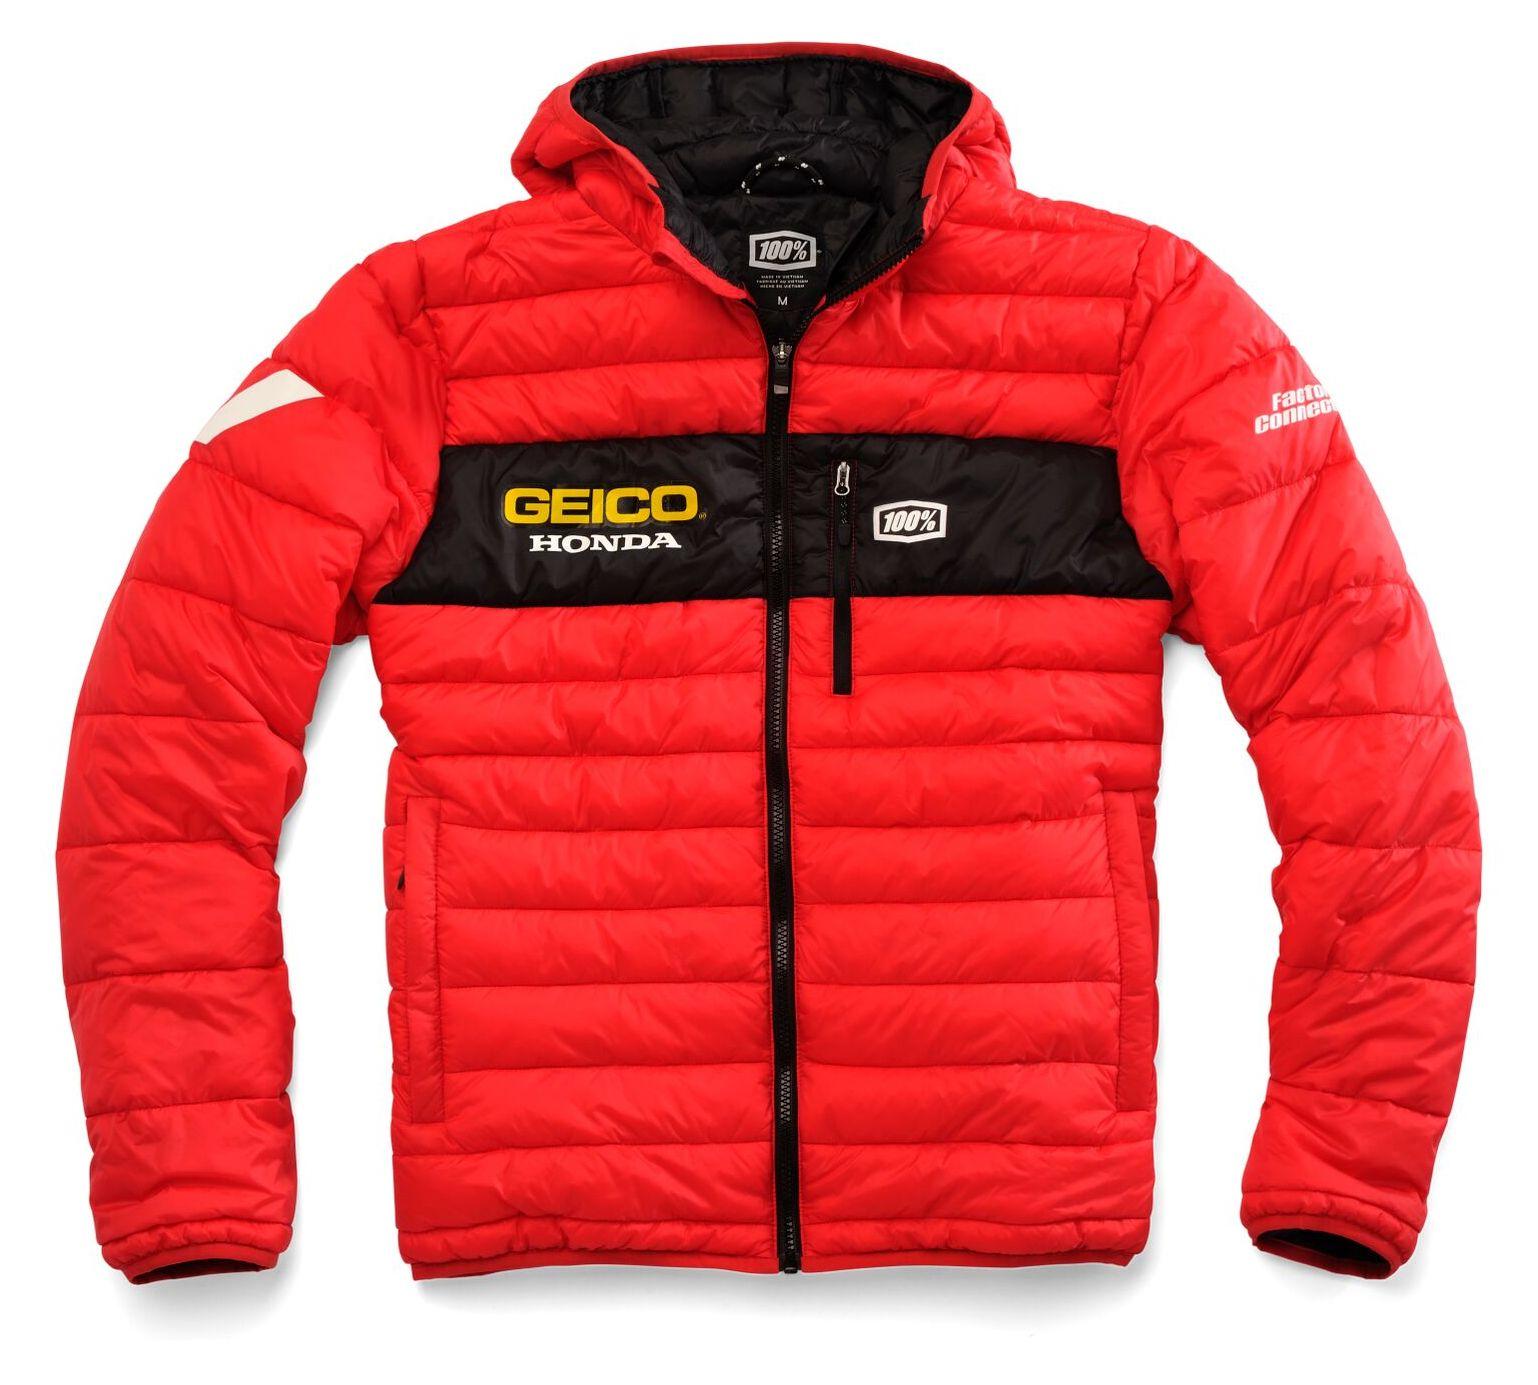 Pro Taper Handlebars >> 100% Team Geico Honda Mode Jacket - Cycle Gear